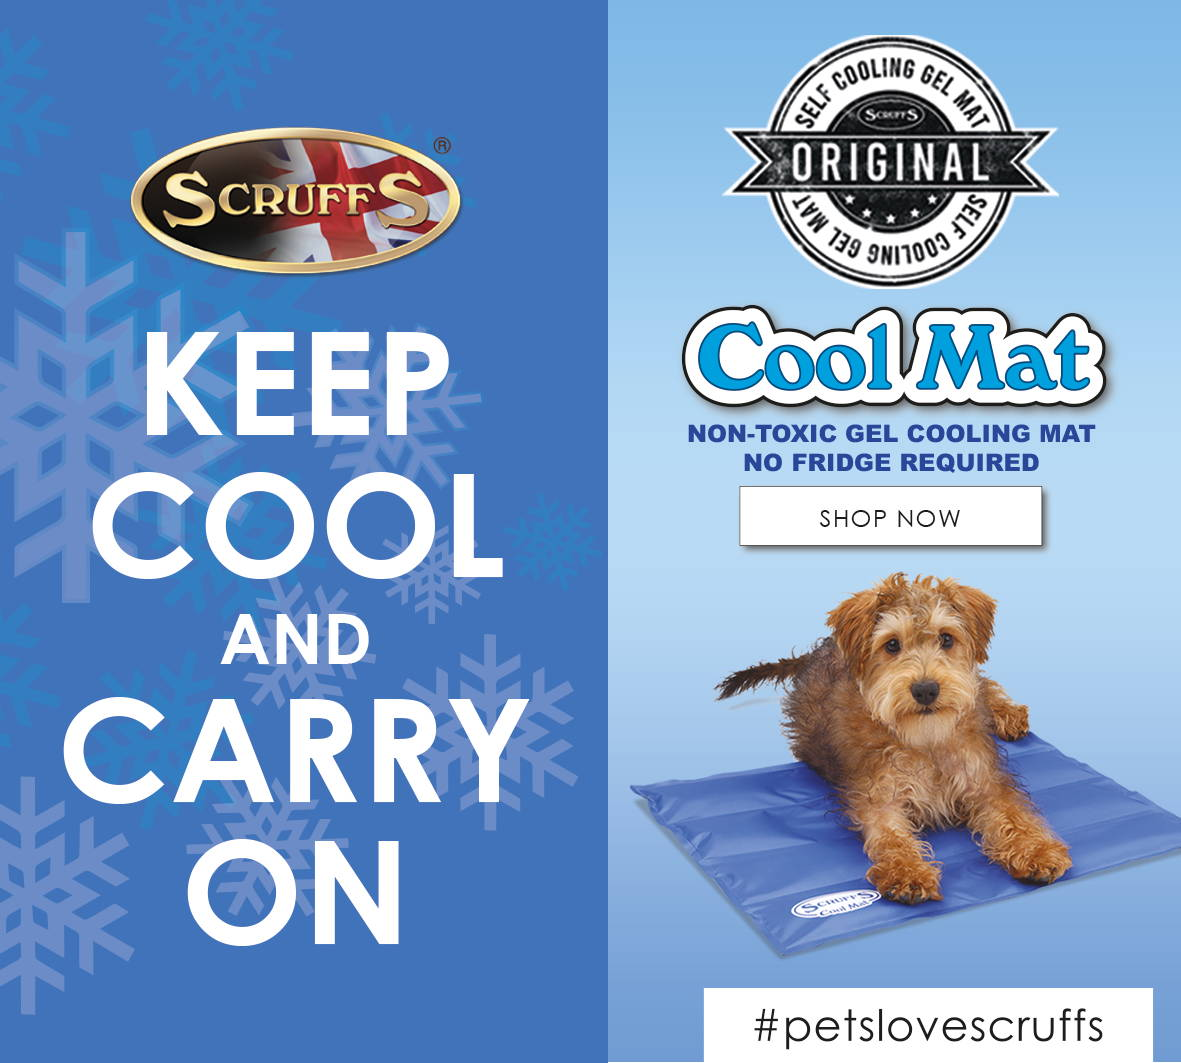 scruffs self-cooling mat